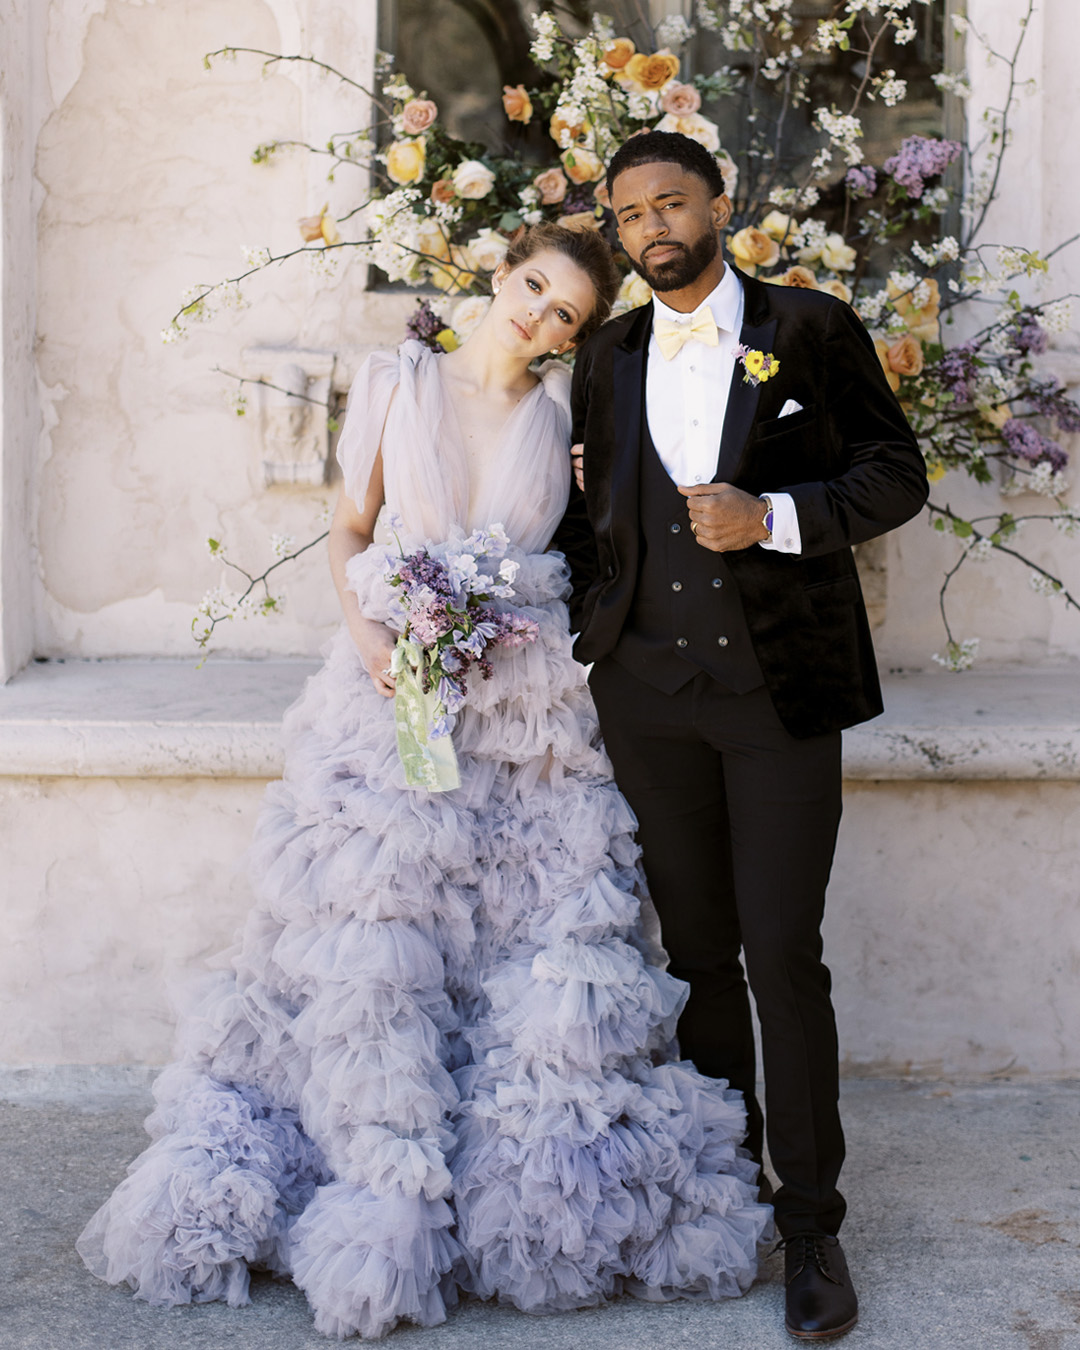 purple tulle wedding dress by Millia London